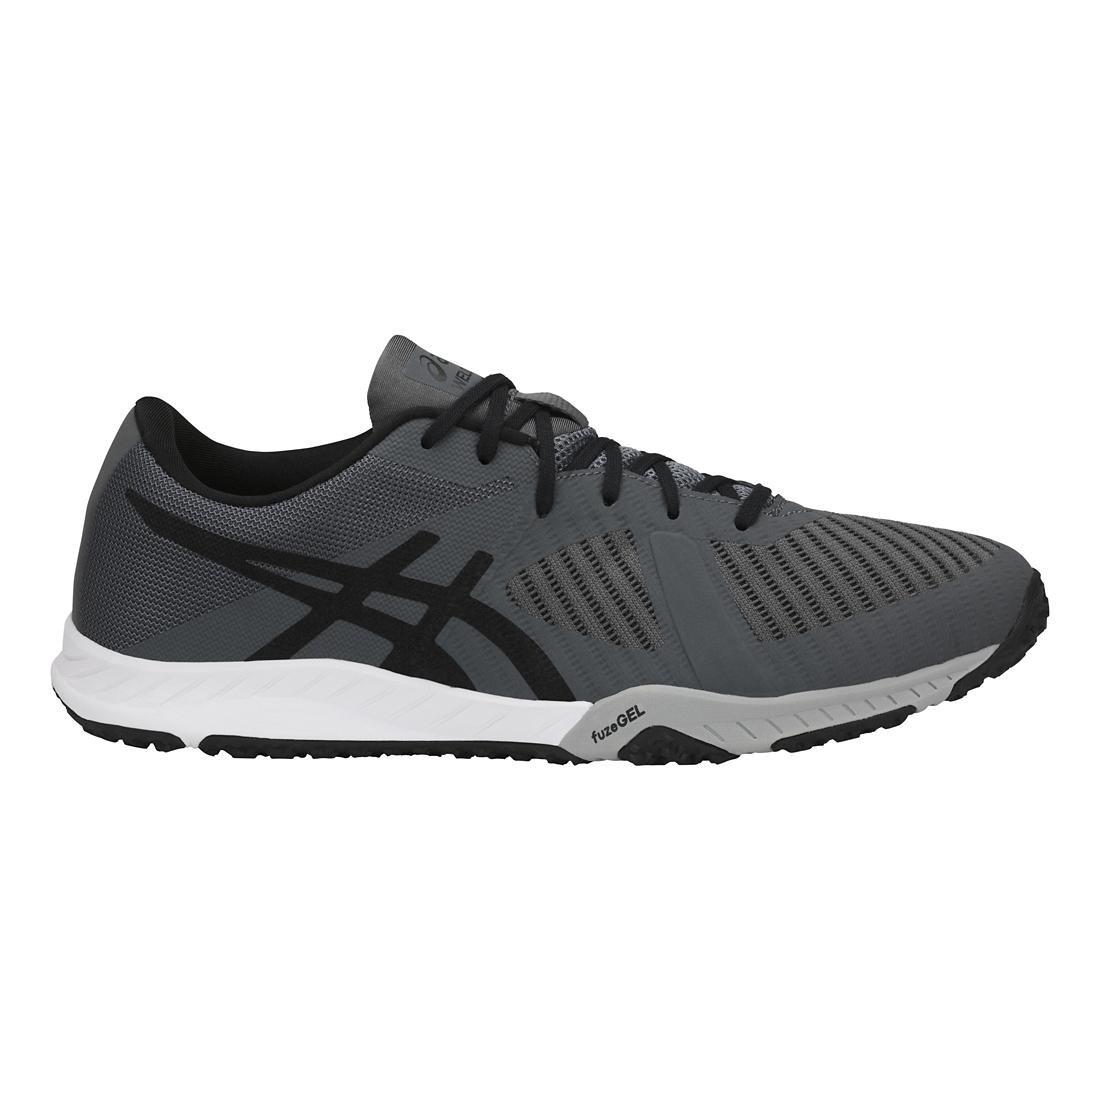 ASICS Mens Weldon x Fabric Low Top Lace up Running Sneaker B072J1T347 10 D(M) US Carbon/Onyx/Mid Grey